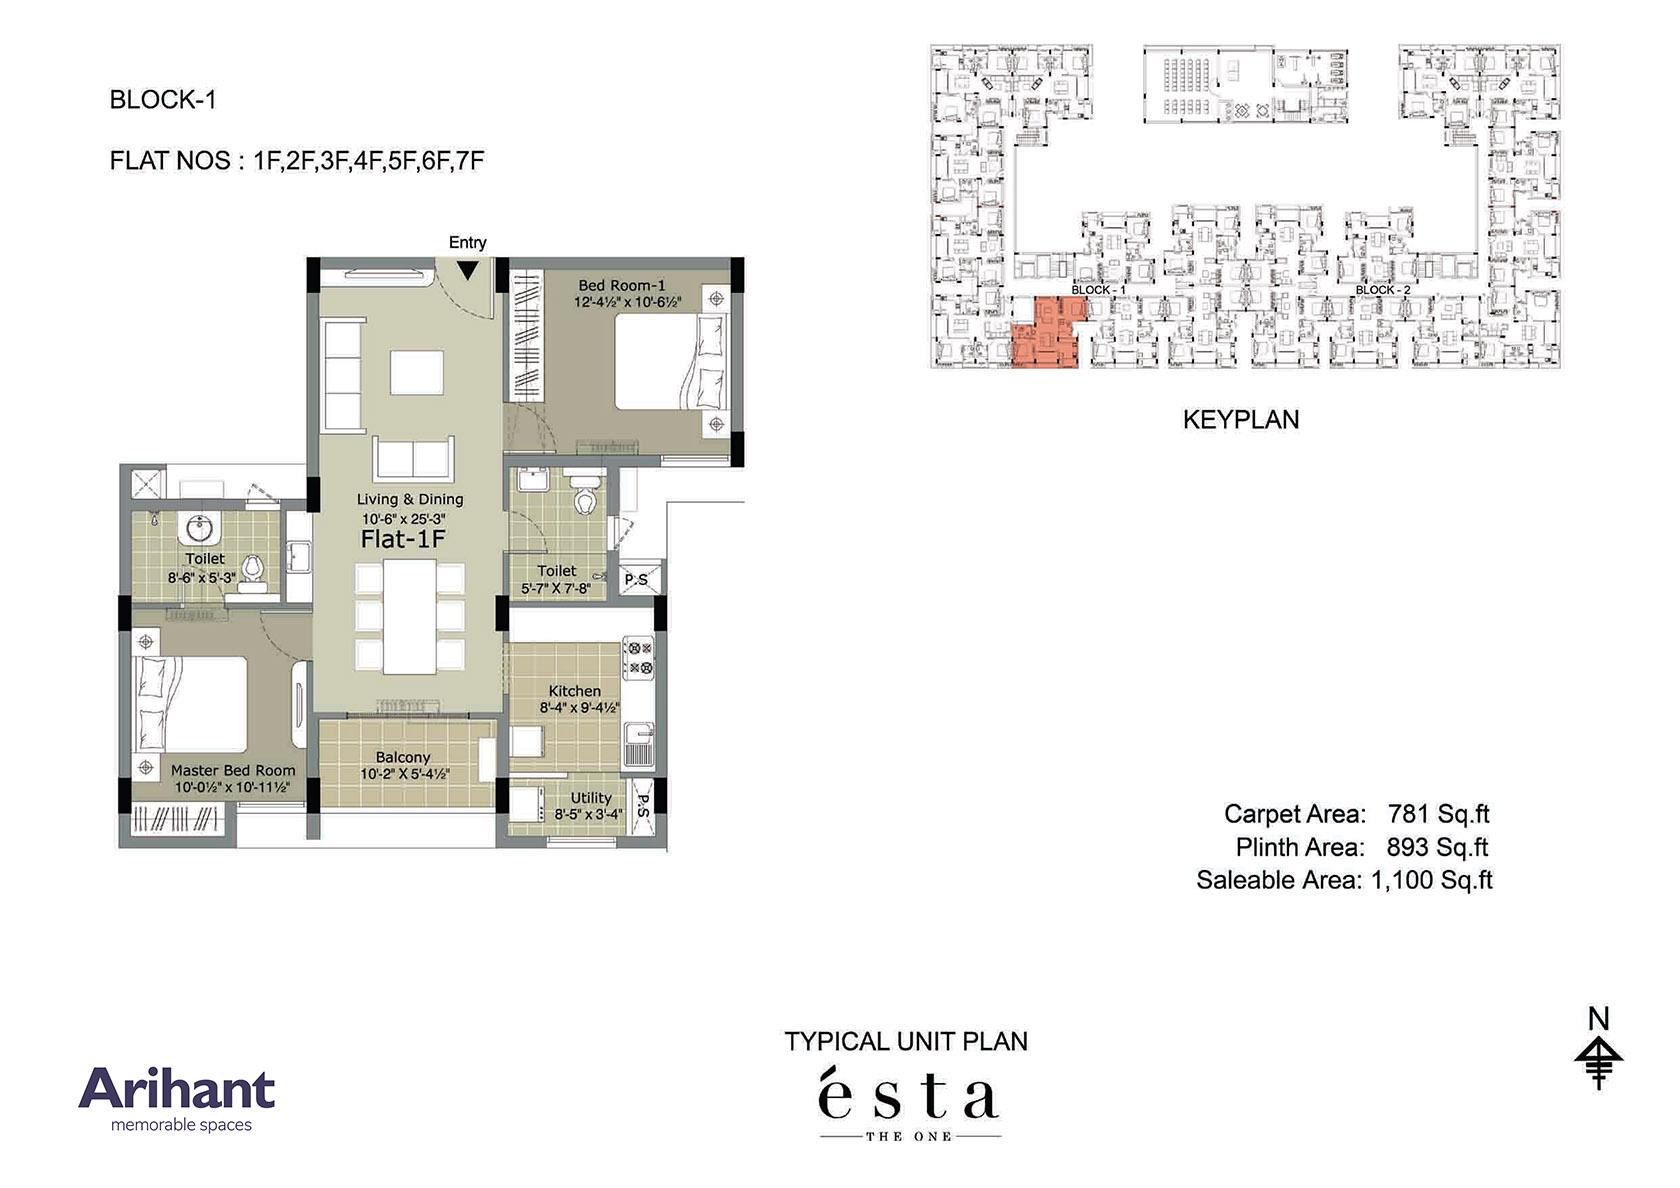 Arihant - Esta_Typical Unit Plan - Block 1 - Type F